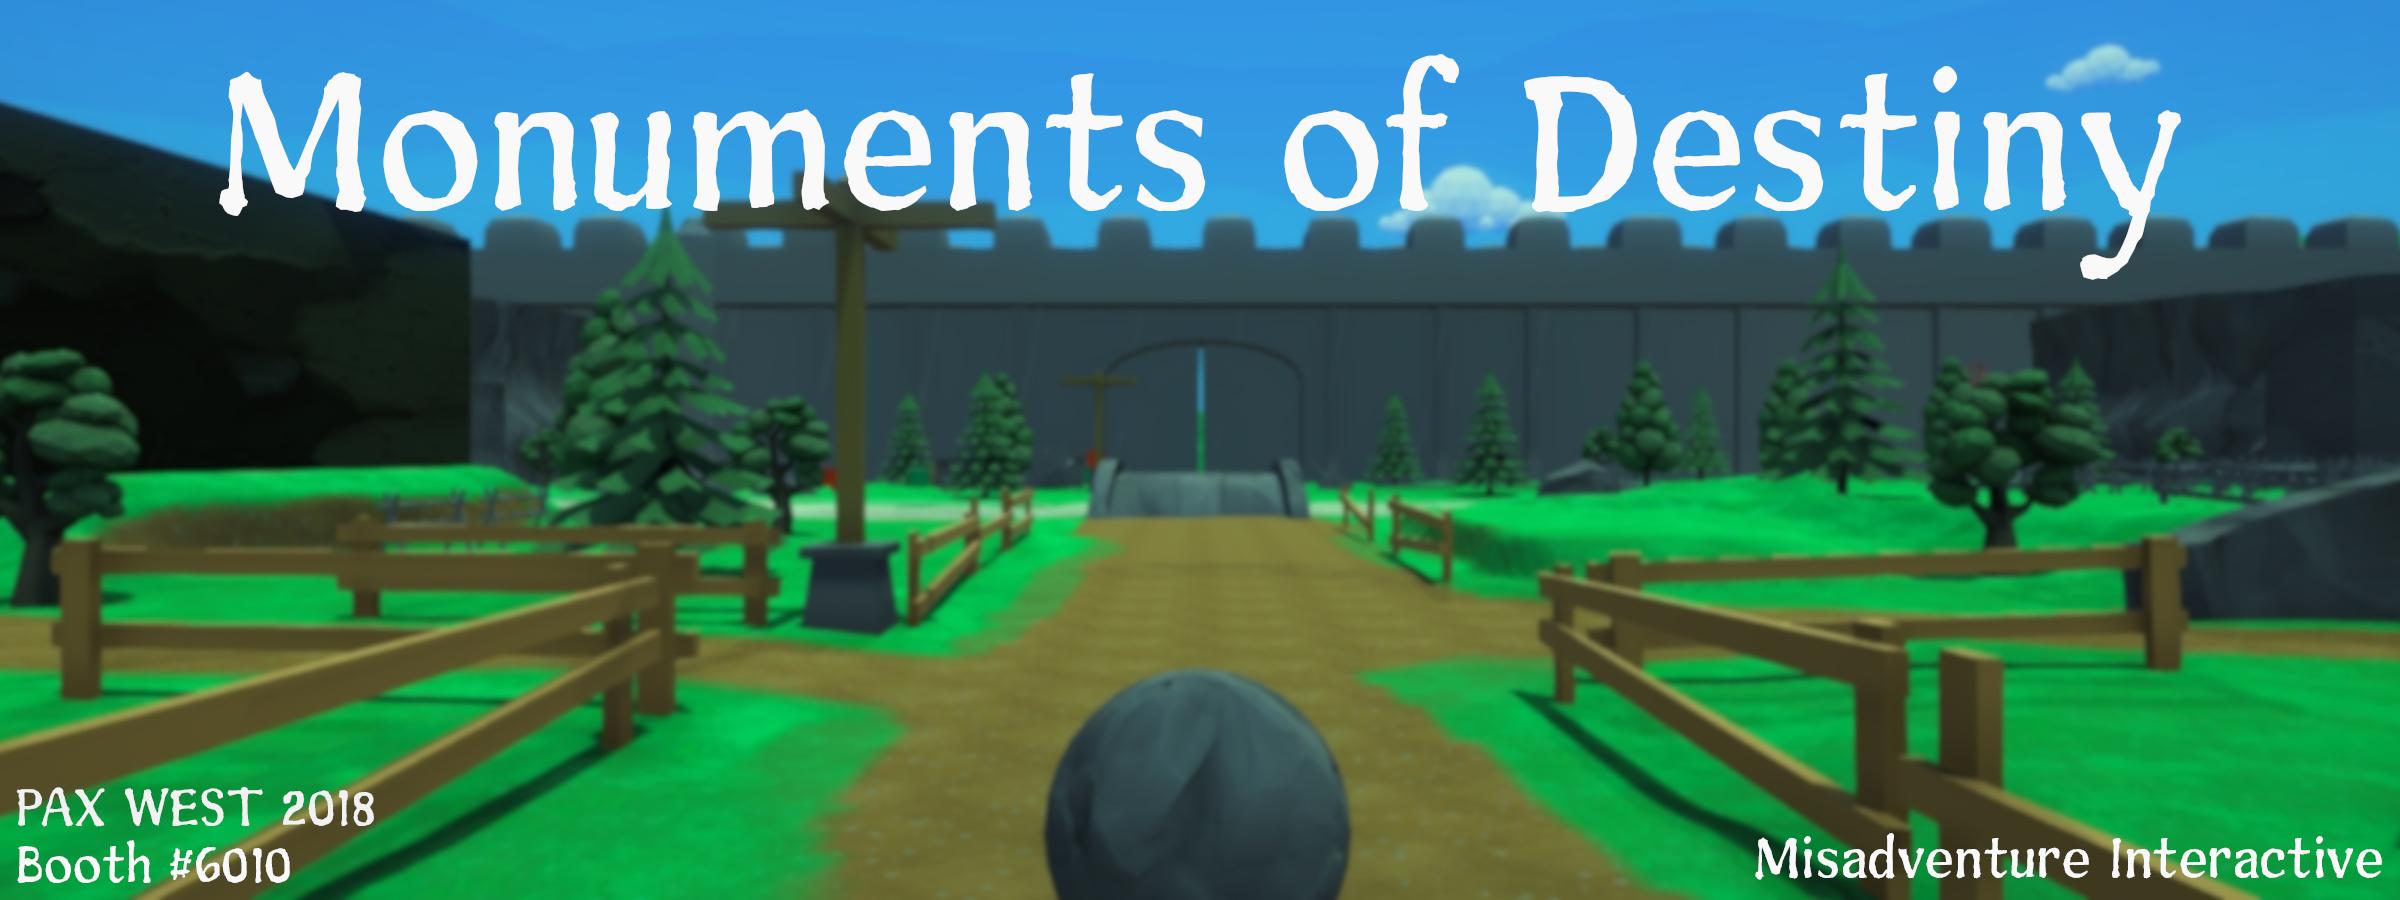 Monuments of Destiny